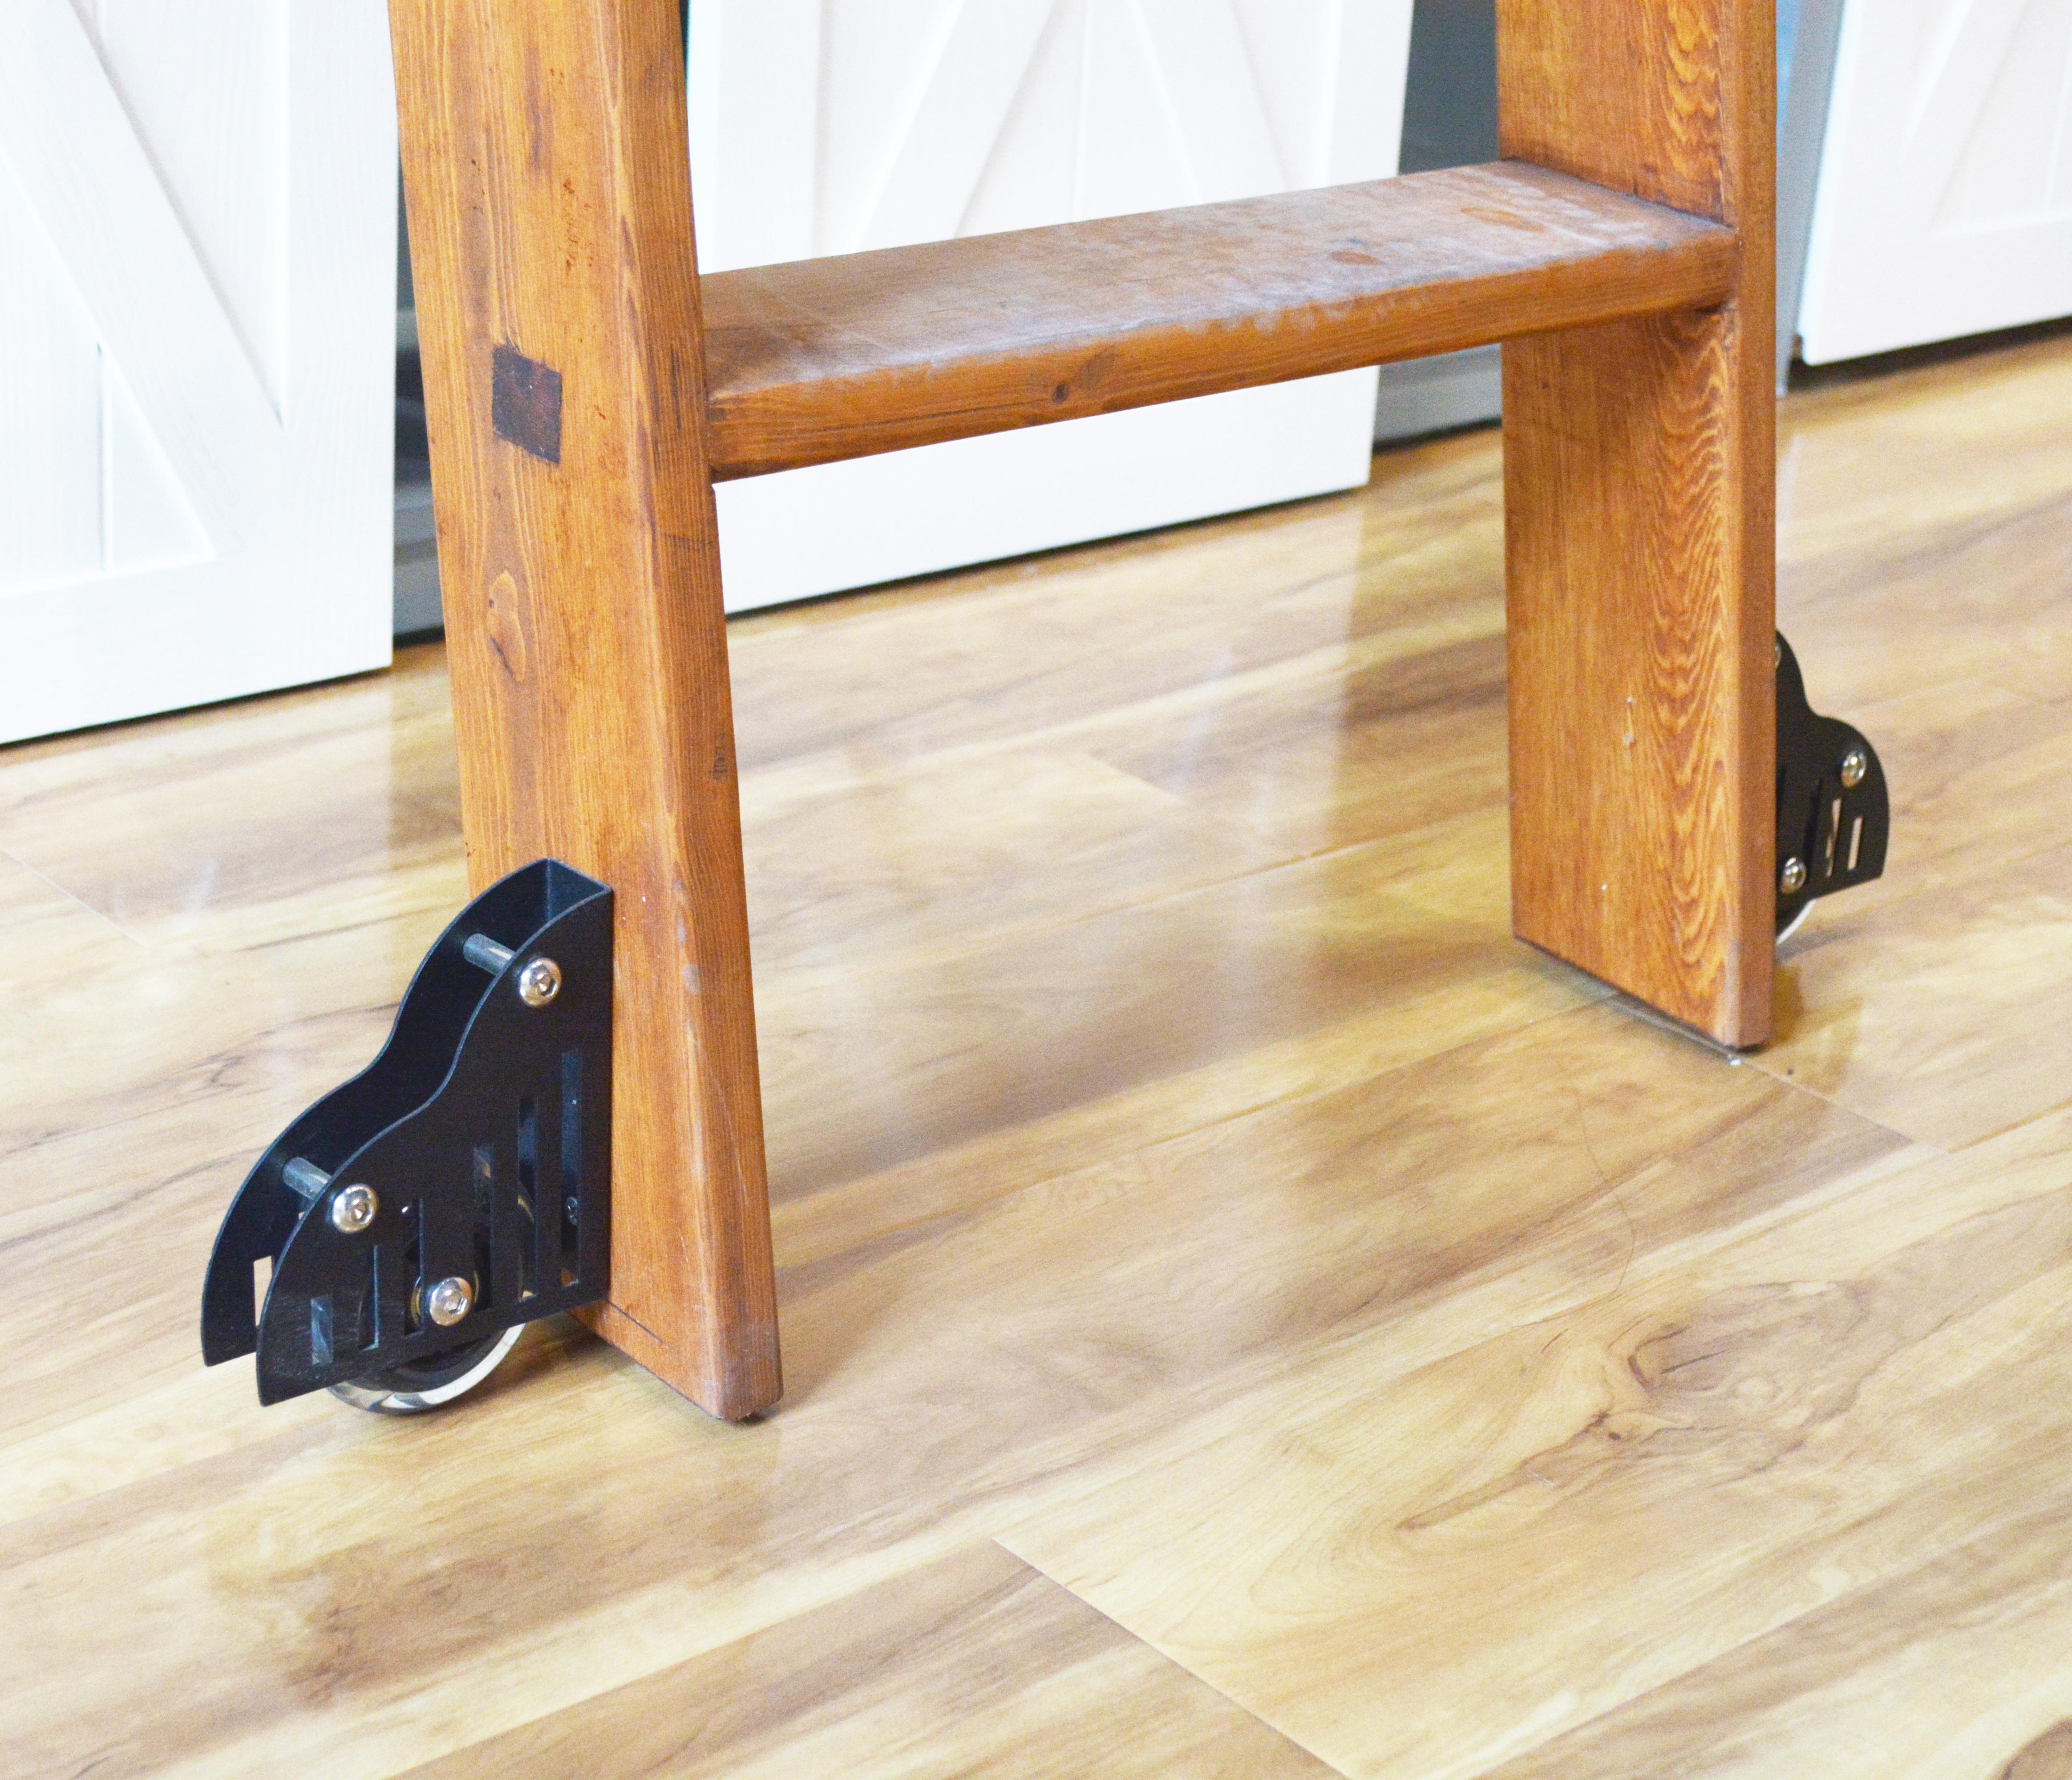 DIYHD Sliding Barn Library Ladder Floor Roller Furniture Floor Roller Set(2pcs)